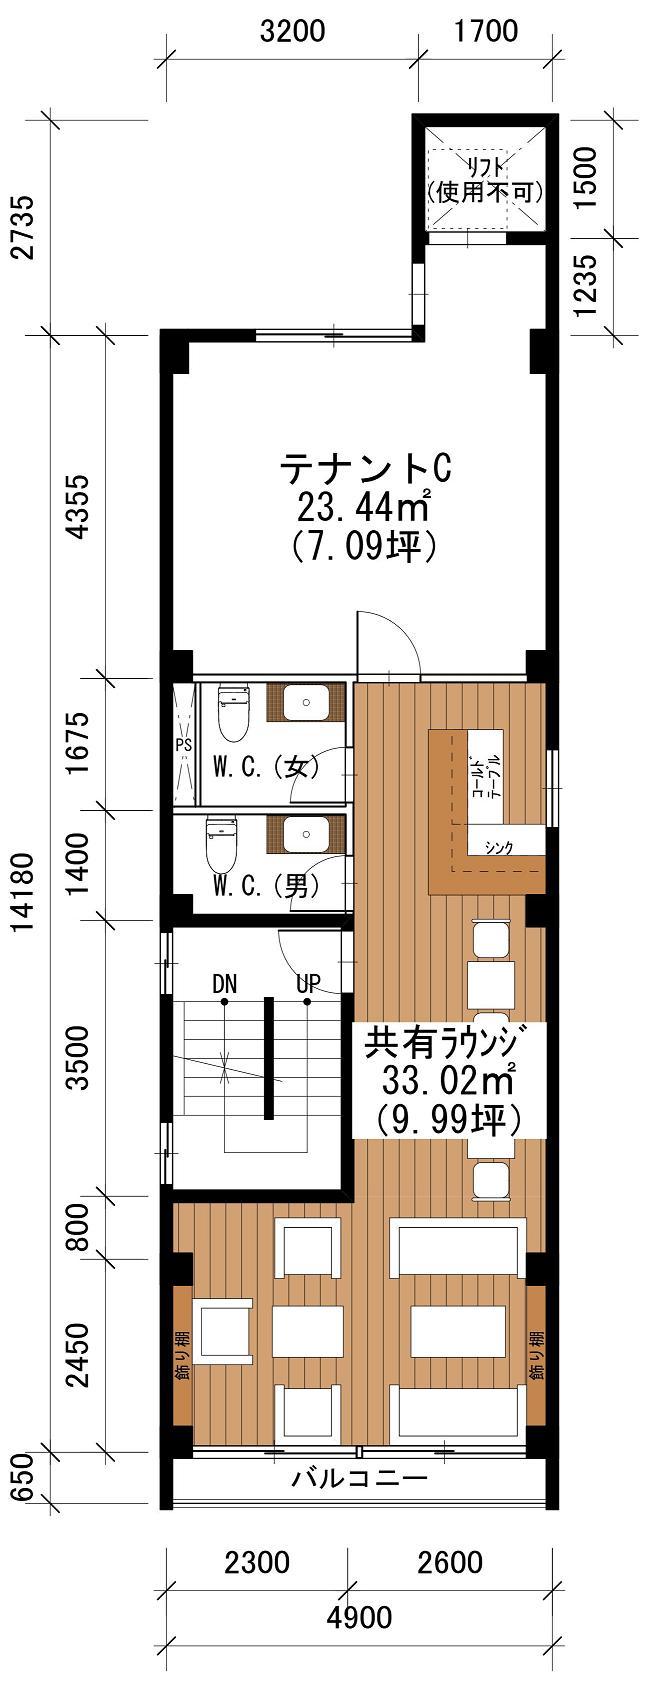 The Office葵 3階平面図161121(HP用)